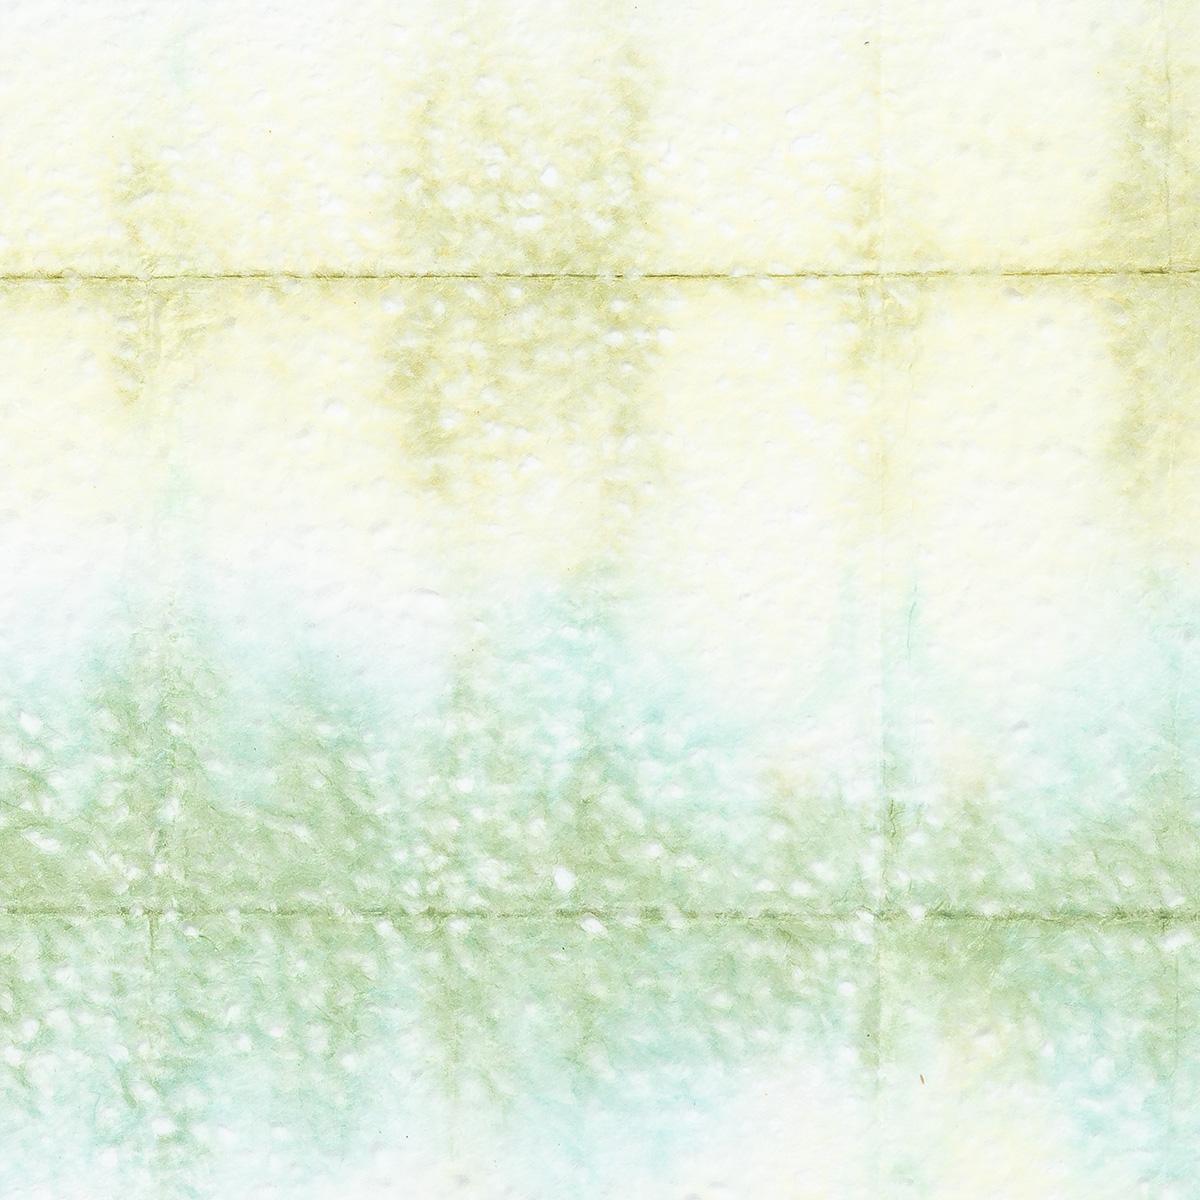 落水紙(春雨)板締め No.28